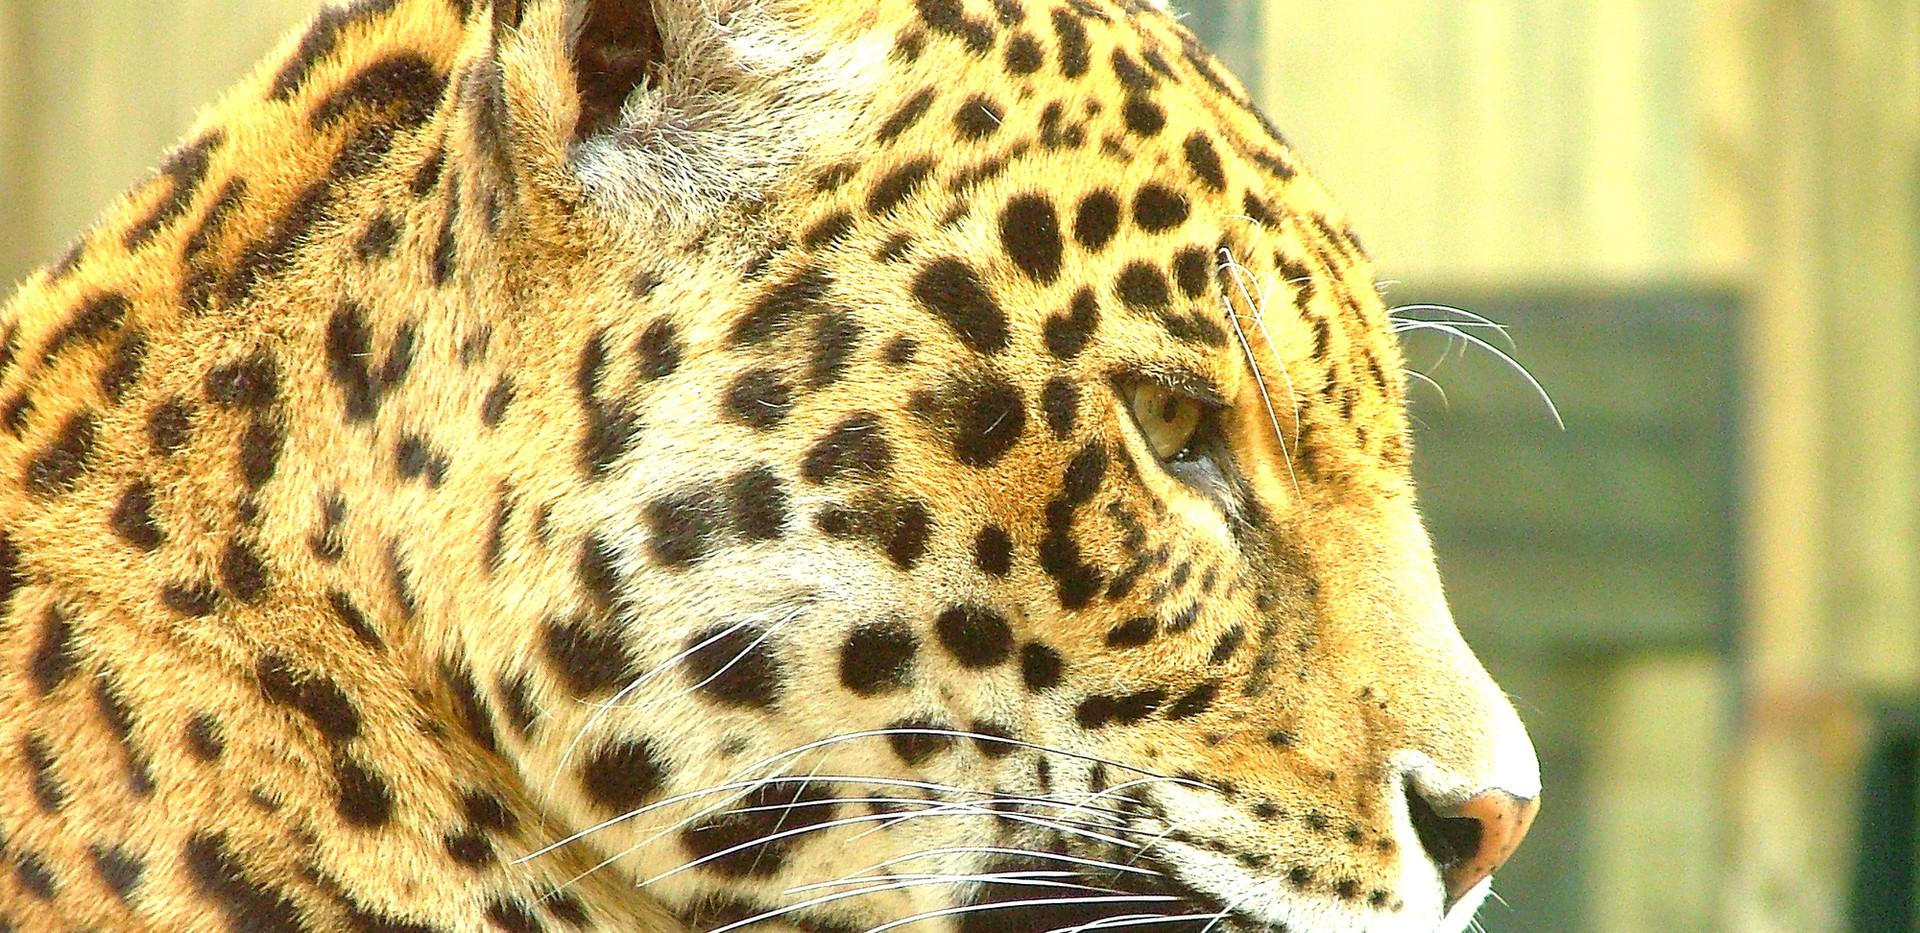 leopard-profile-portrait-1400889_edited.